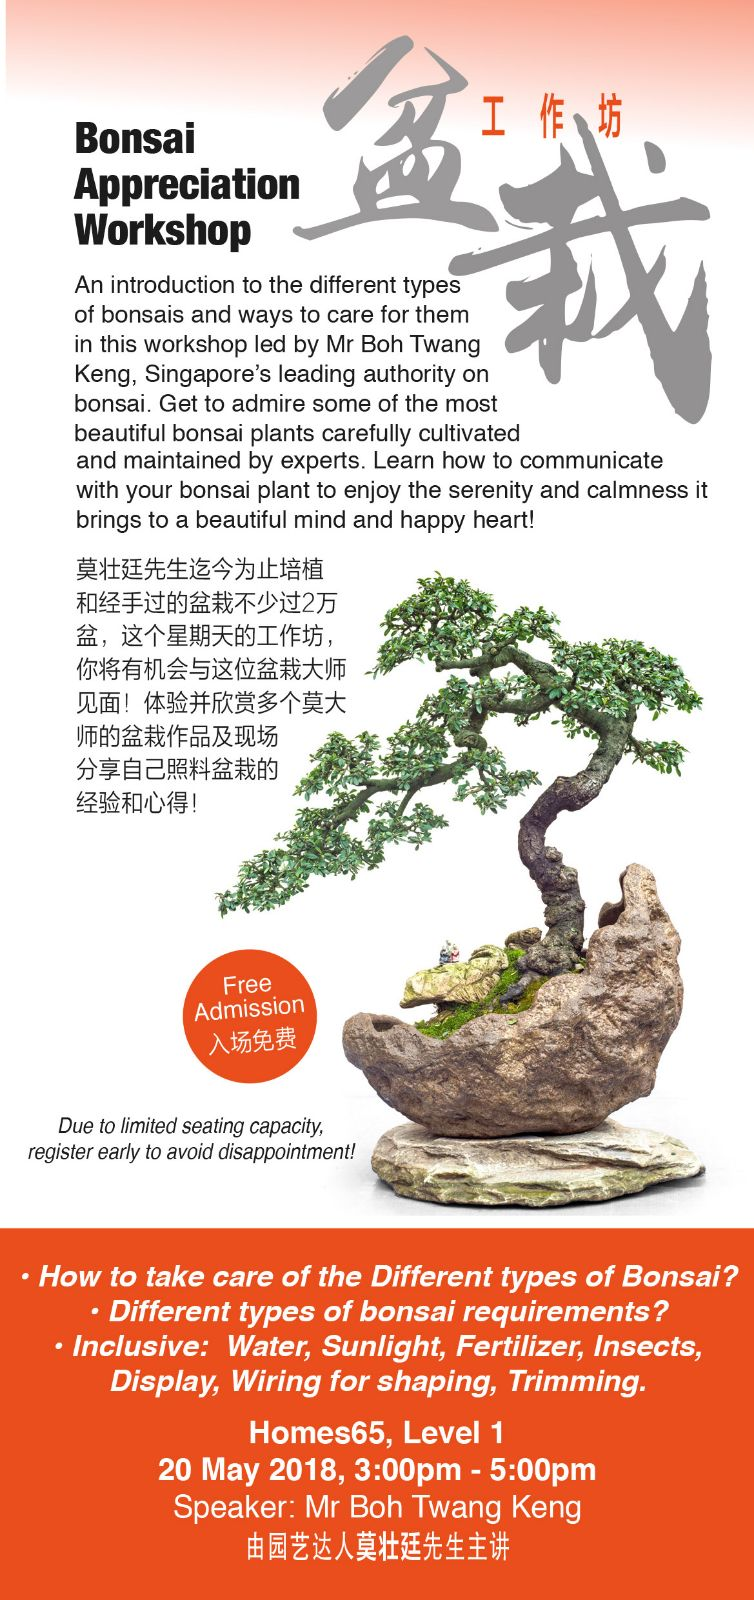 Phenomenal The Arts Of Beautiful Bonsai Lies In Bohs Bonsai Wiring Cloud Oideiuggs Outletorg